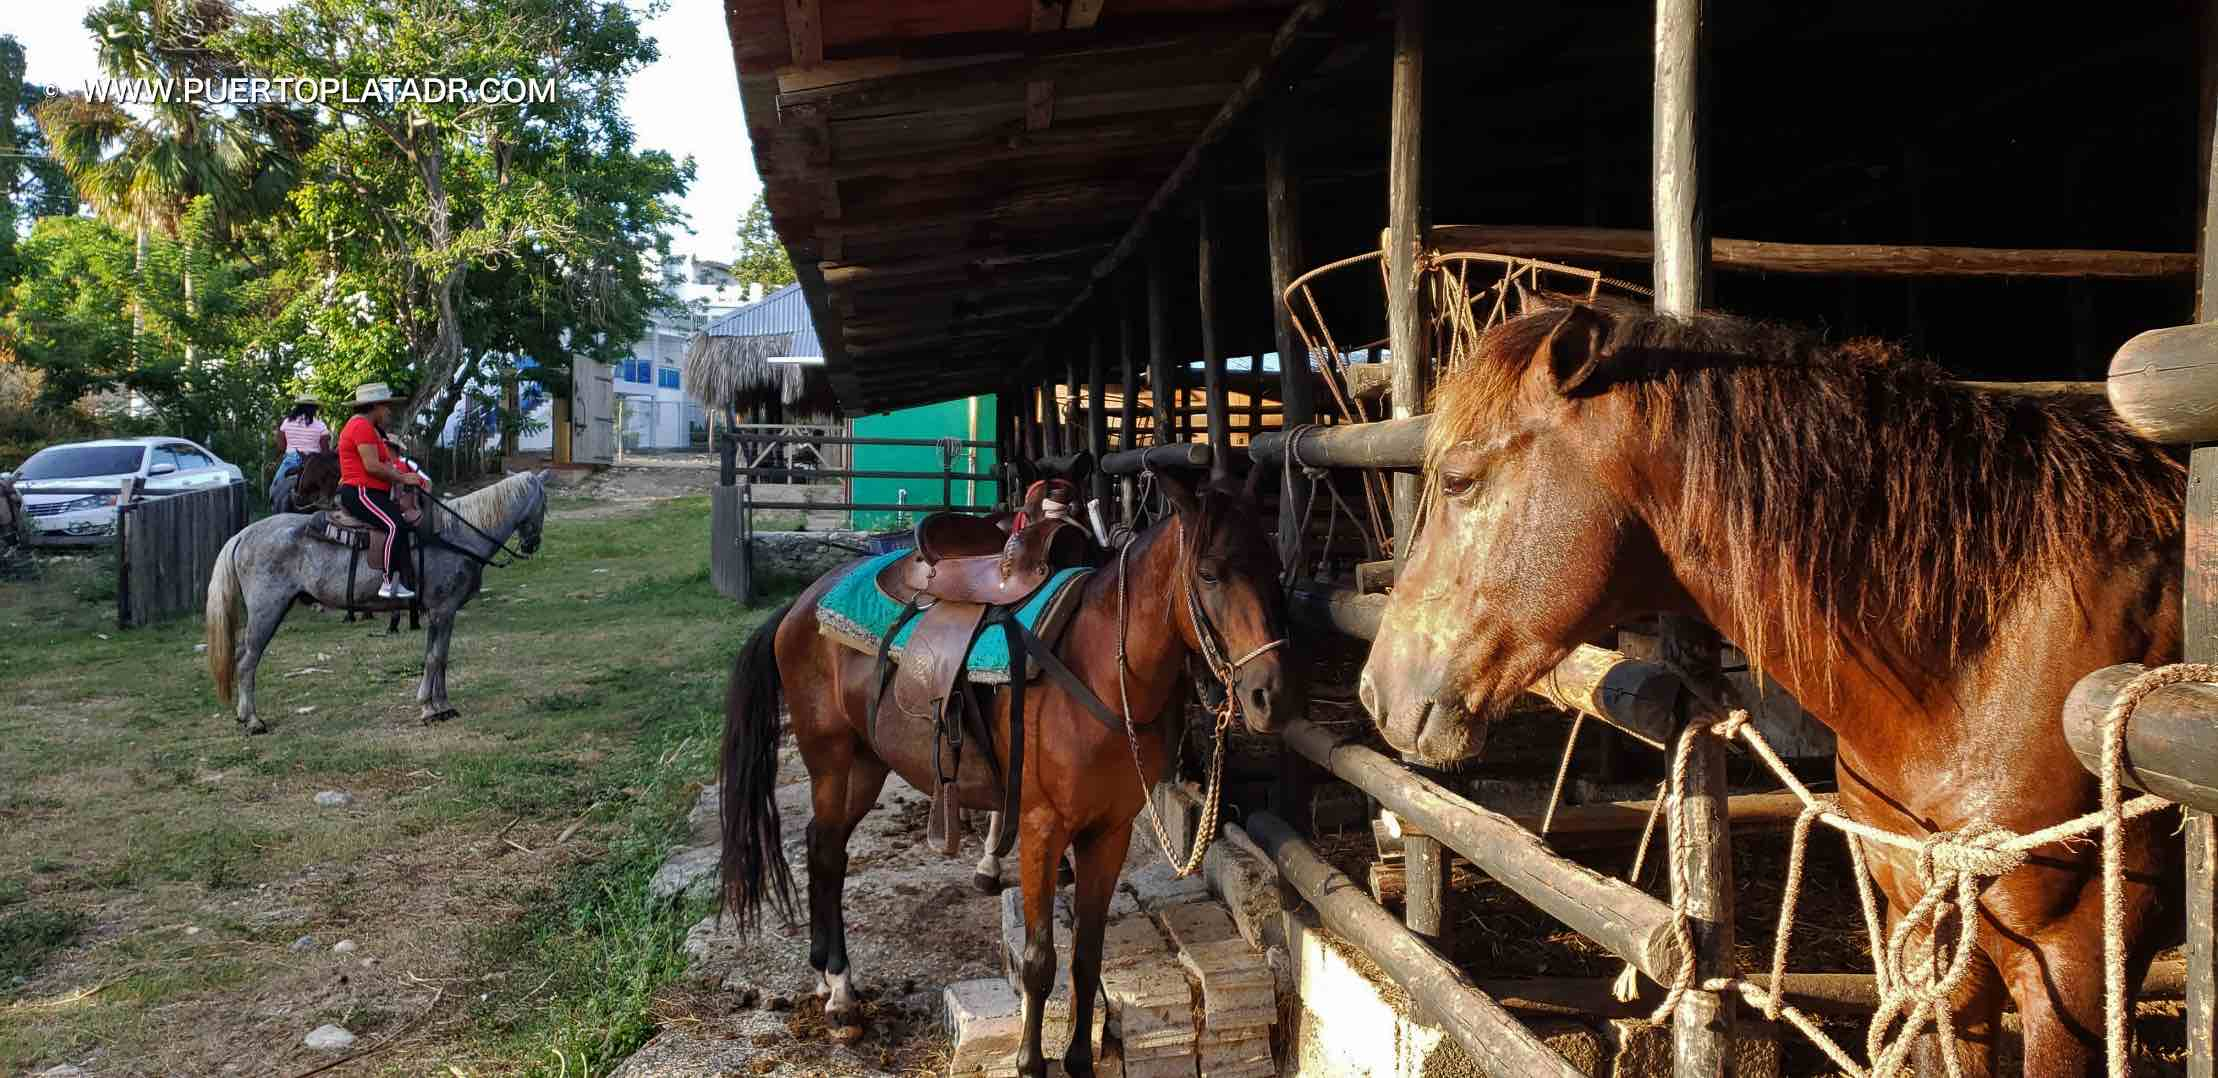 Lorilar ranch in Puerto Plata